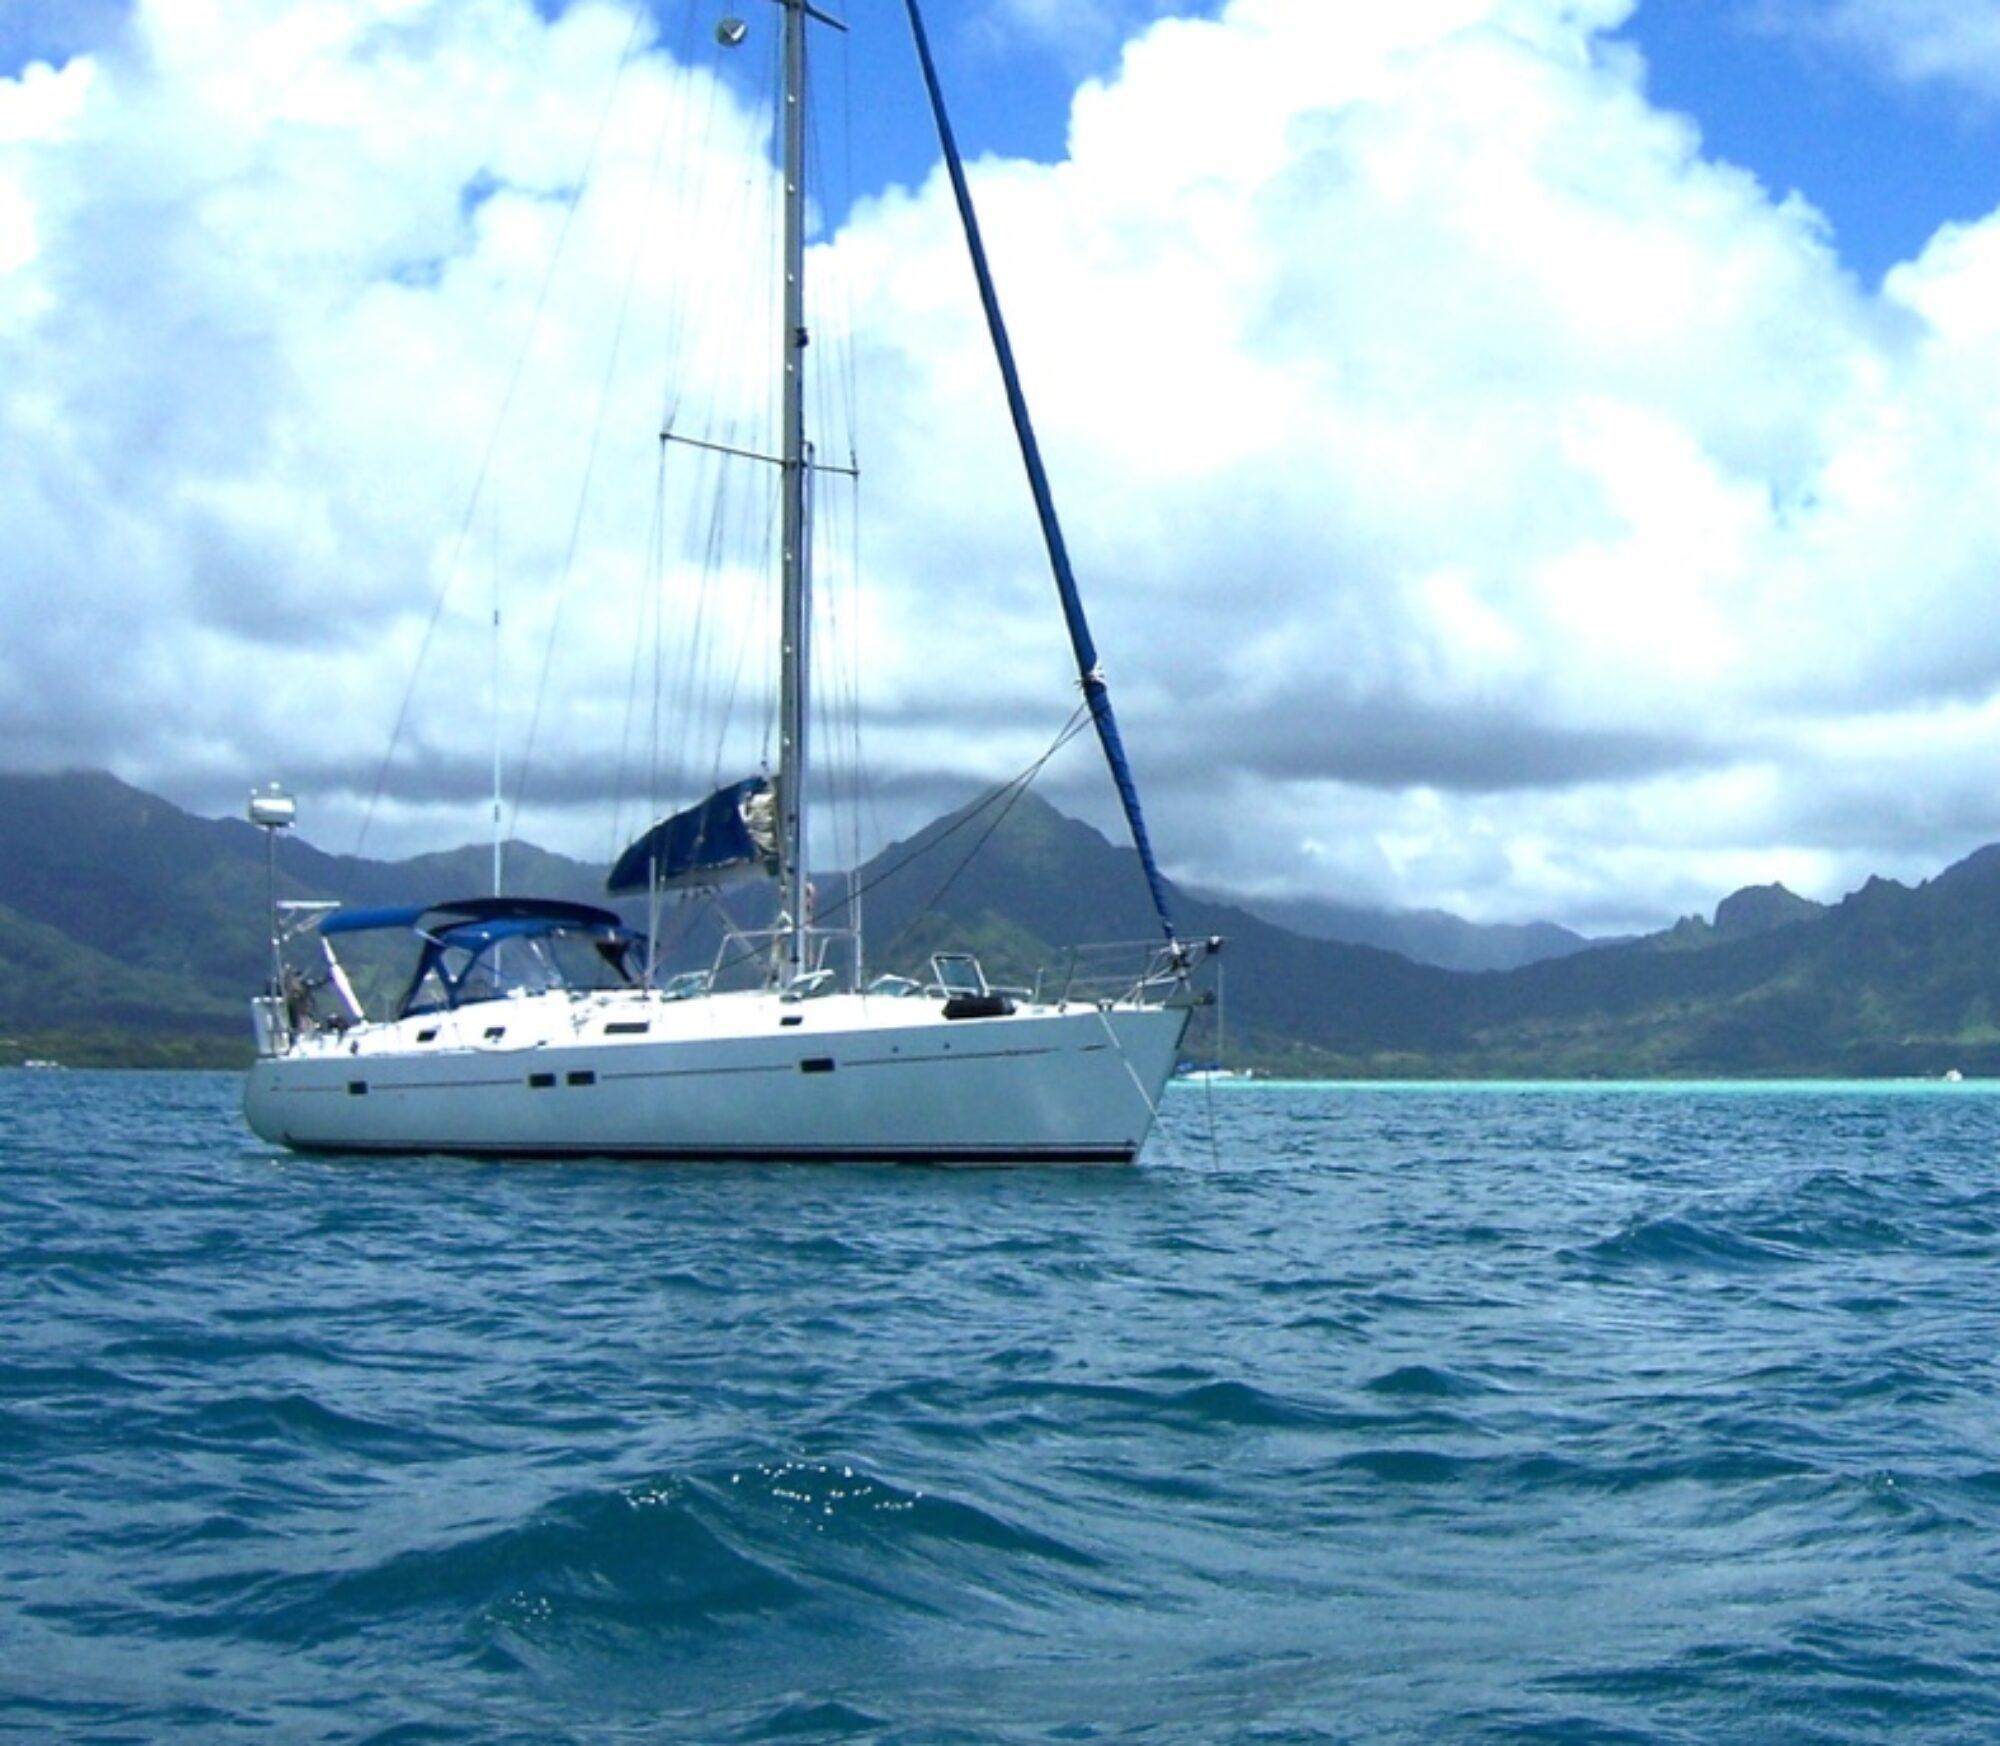 Private Sailing Charters, Honolulu, Oahu, Hawaii